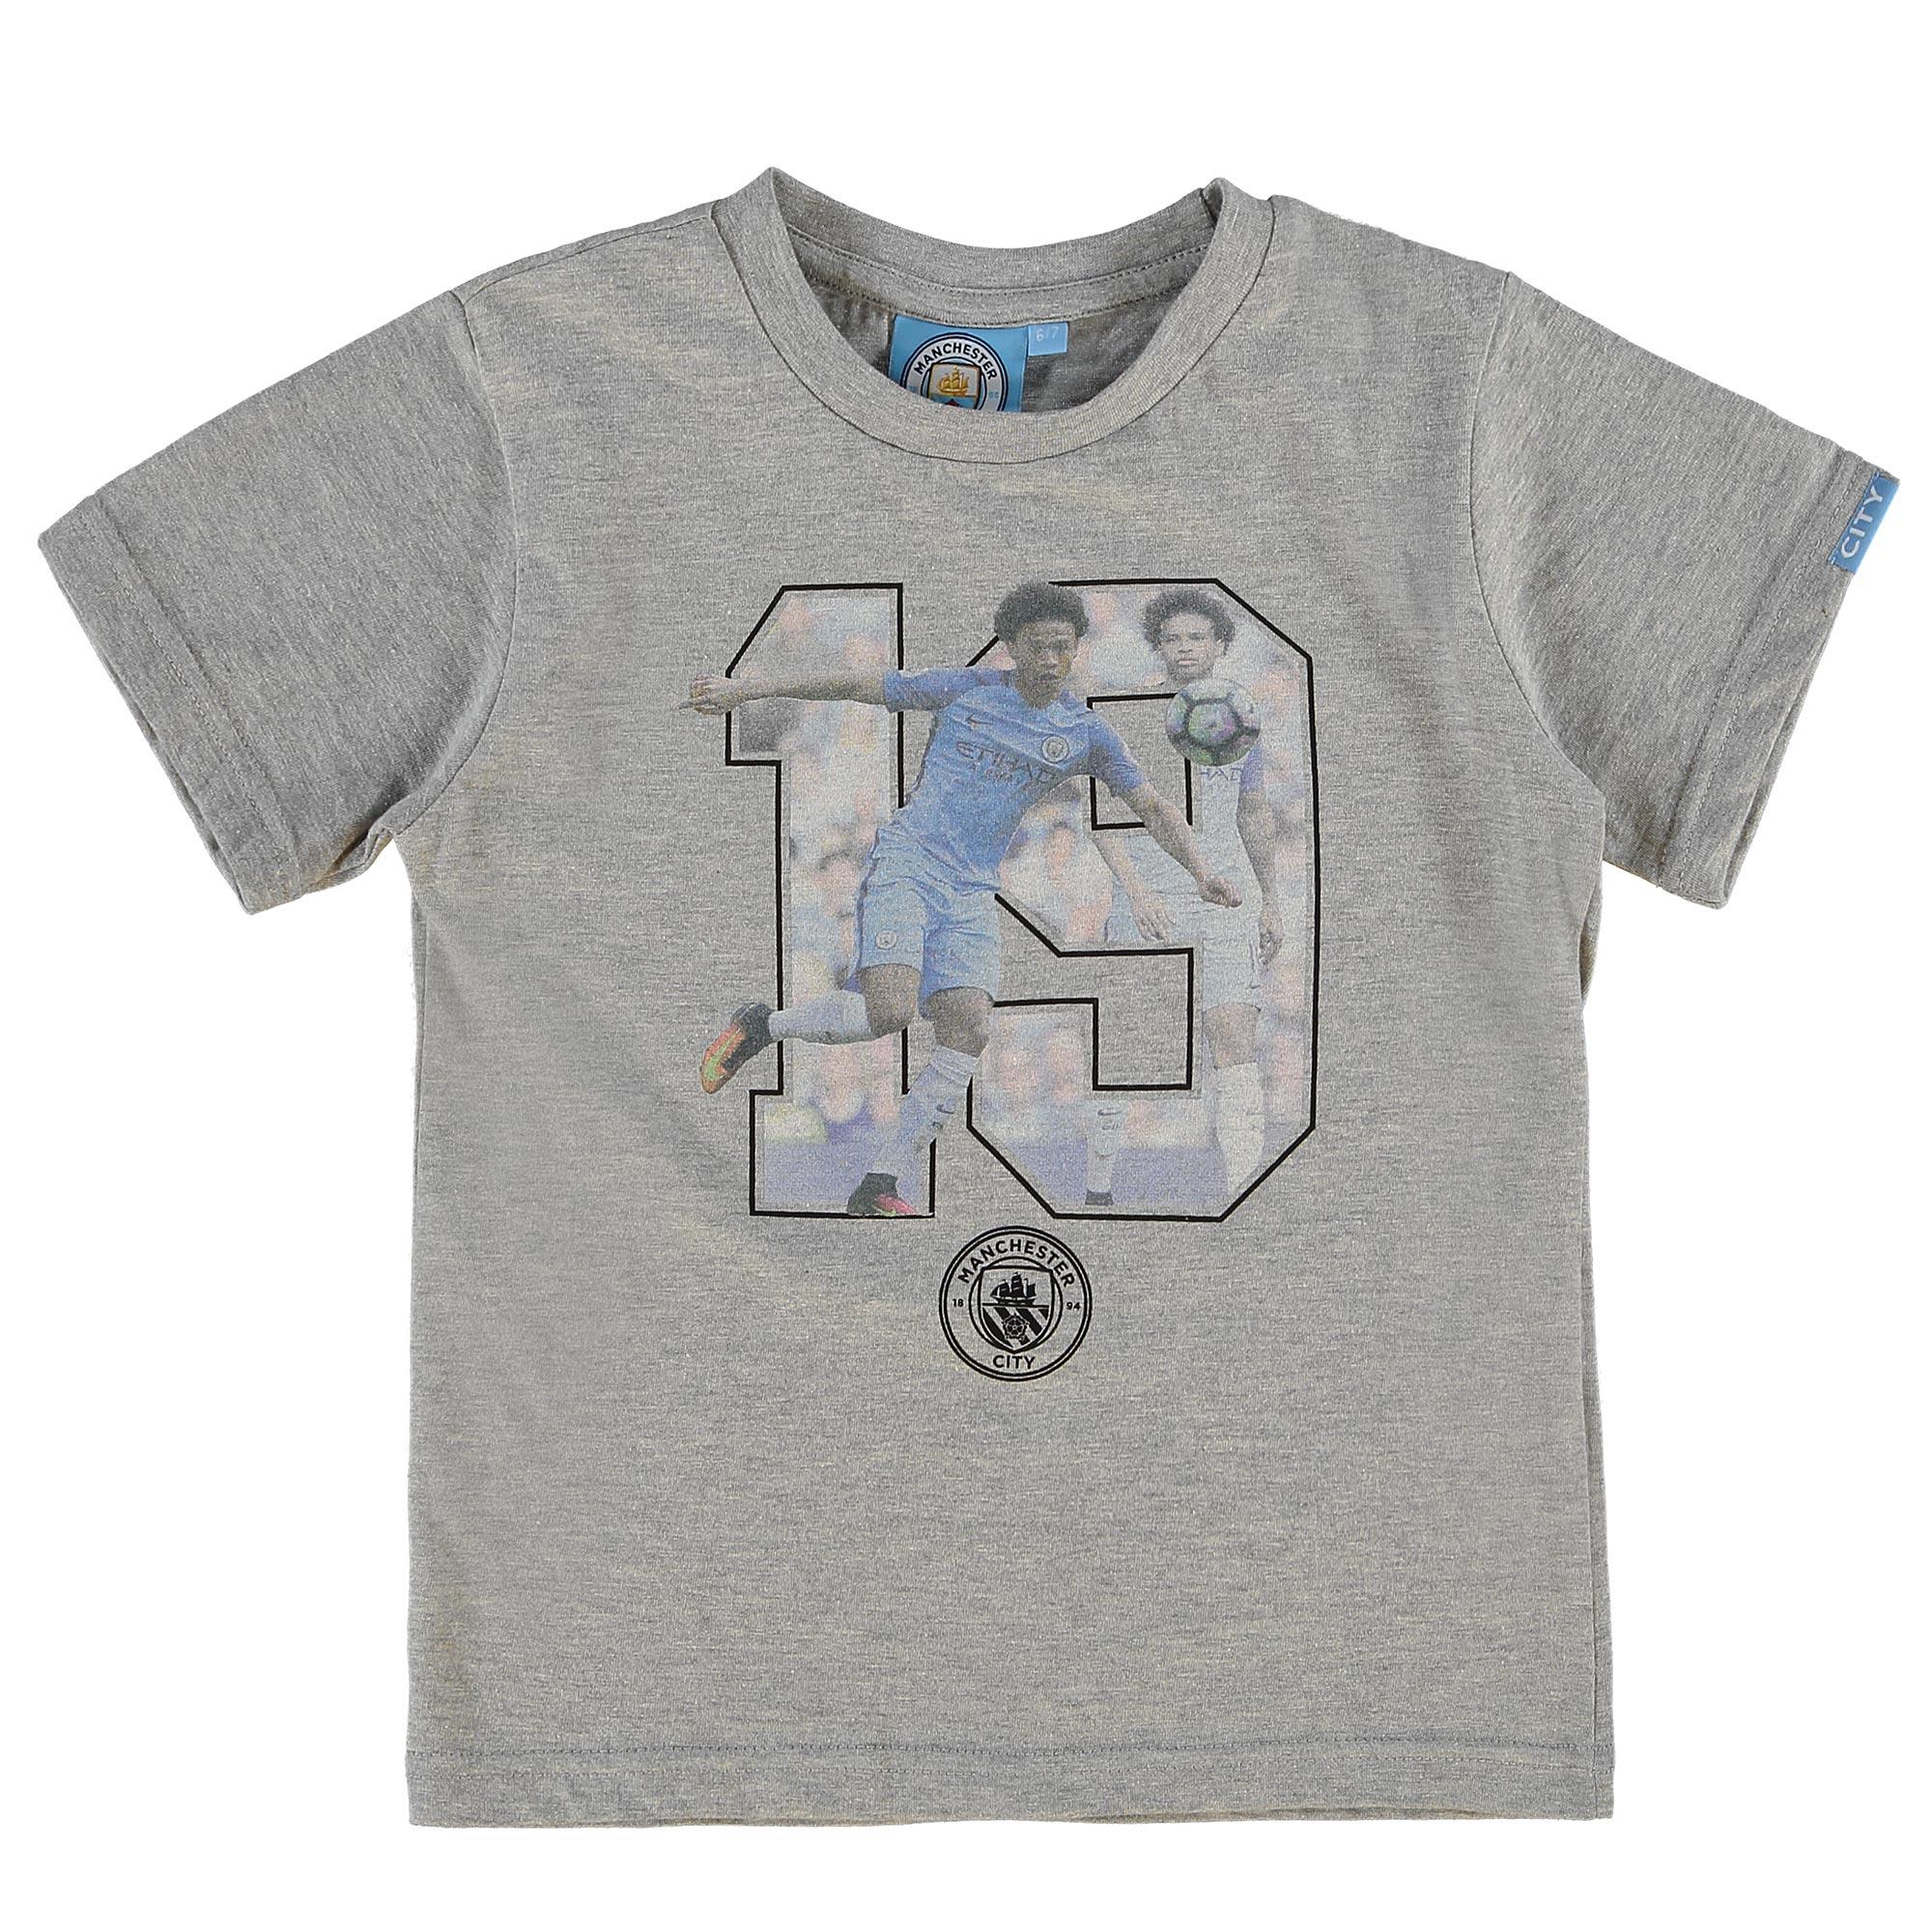 Manchester City Sane T-Shirt - Grey Marl - Junior